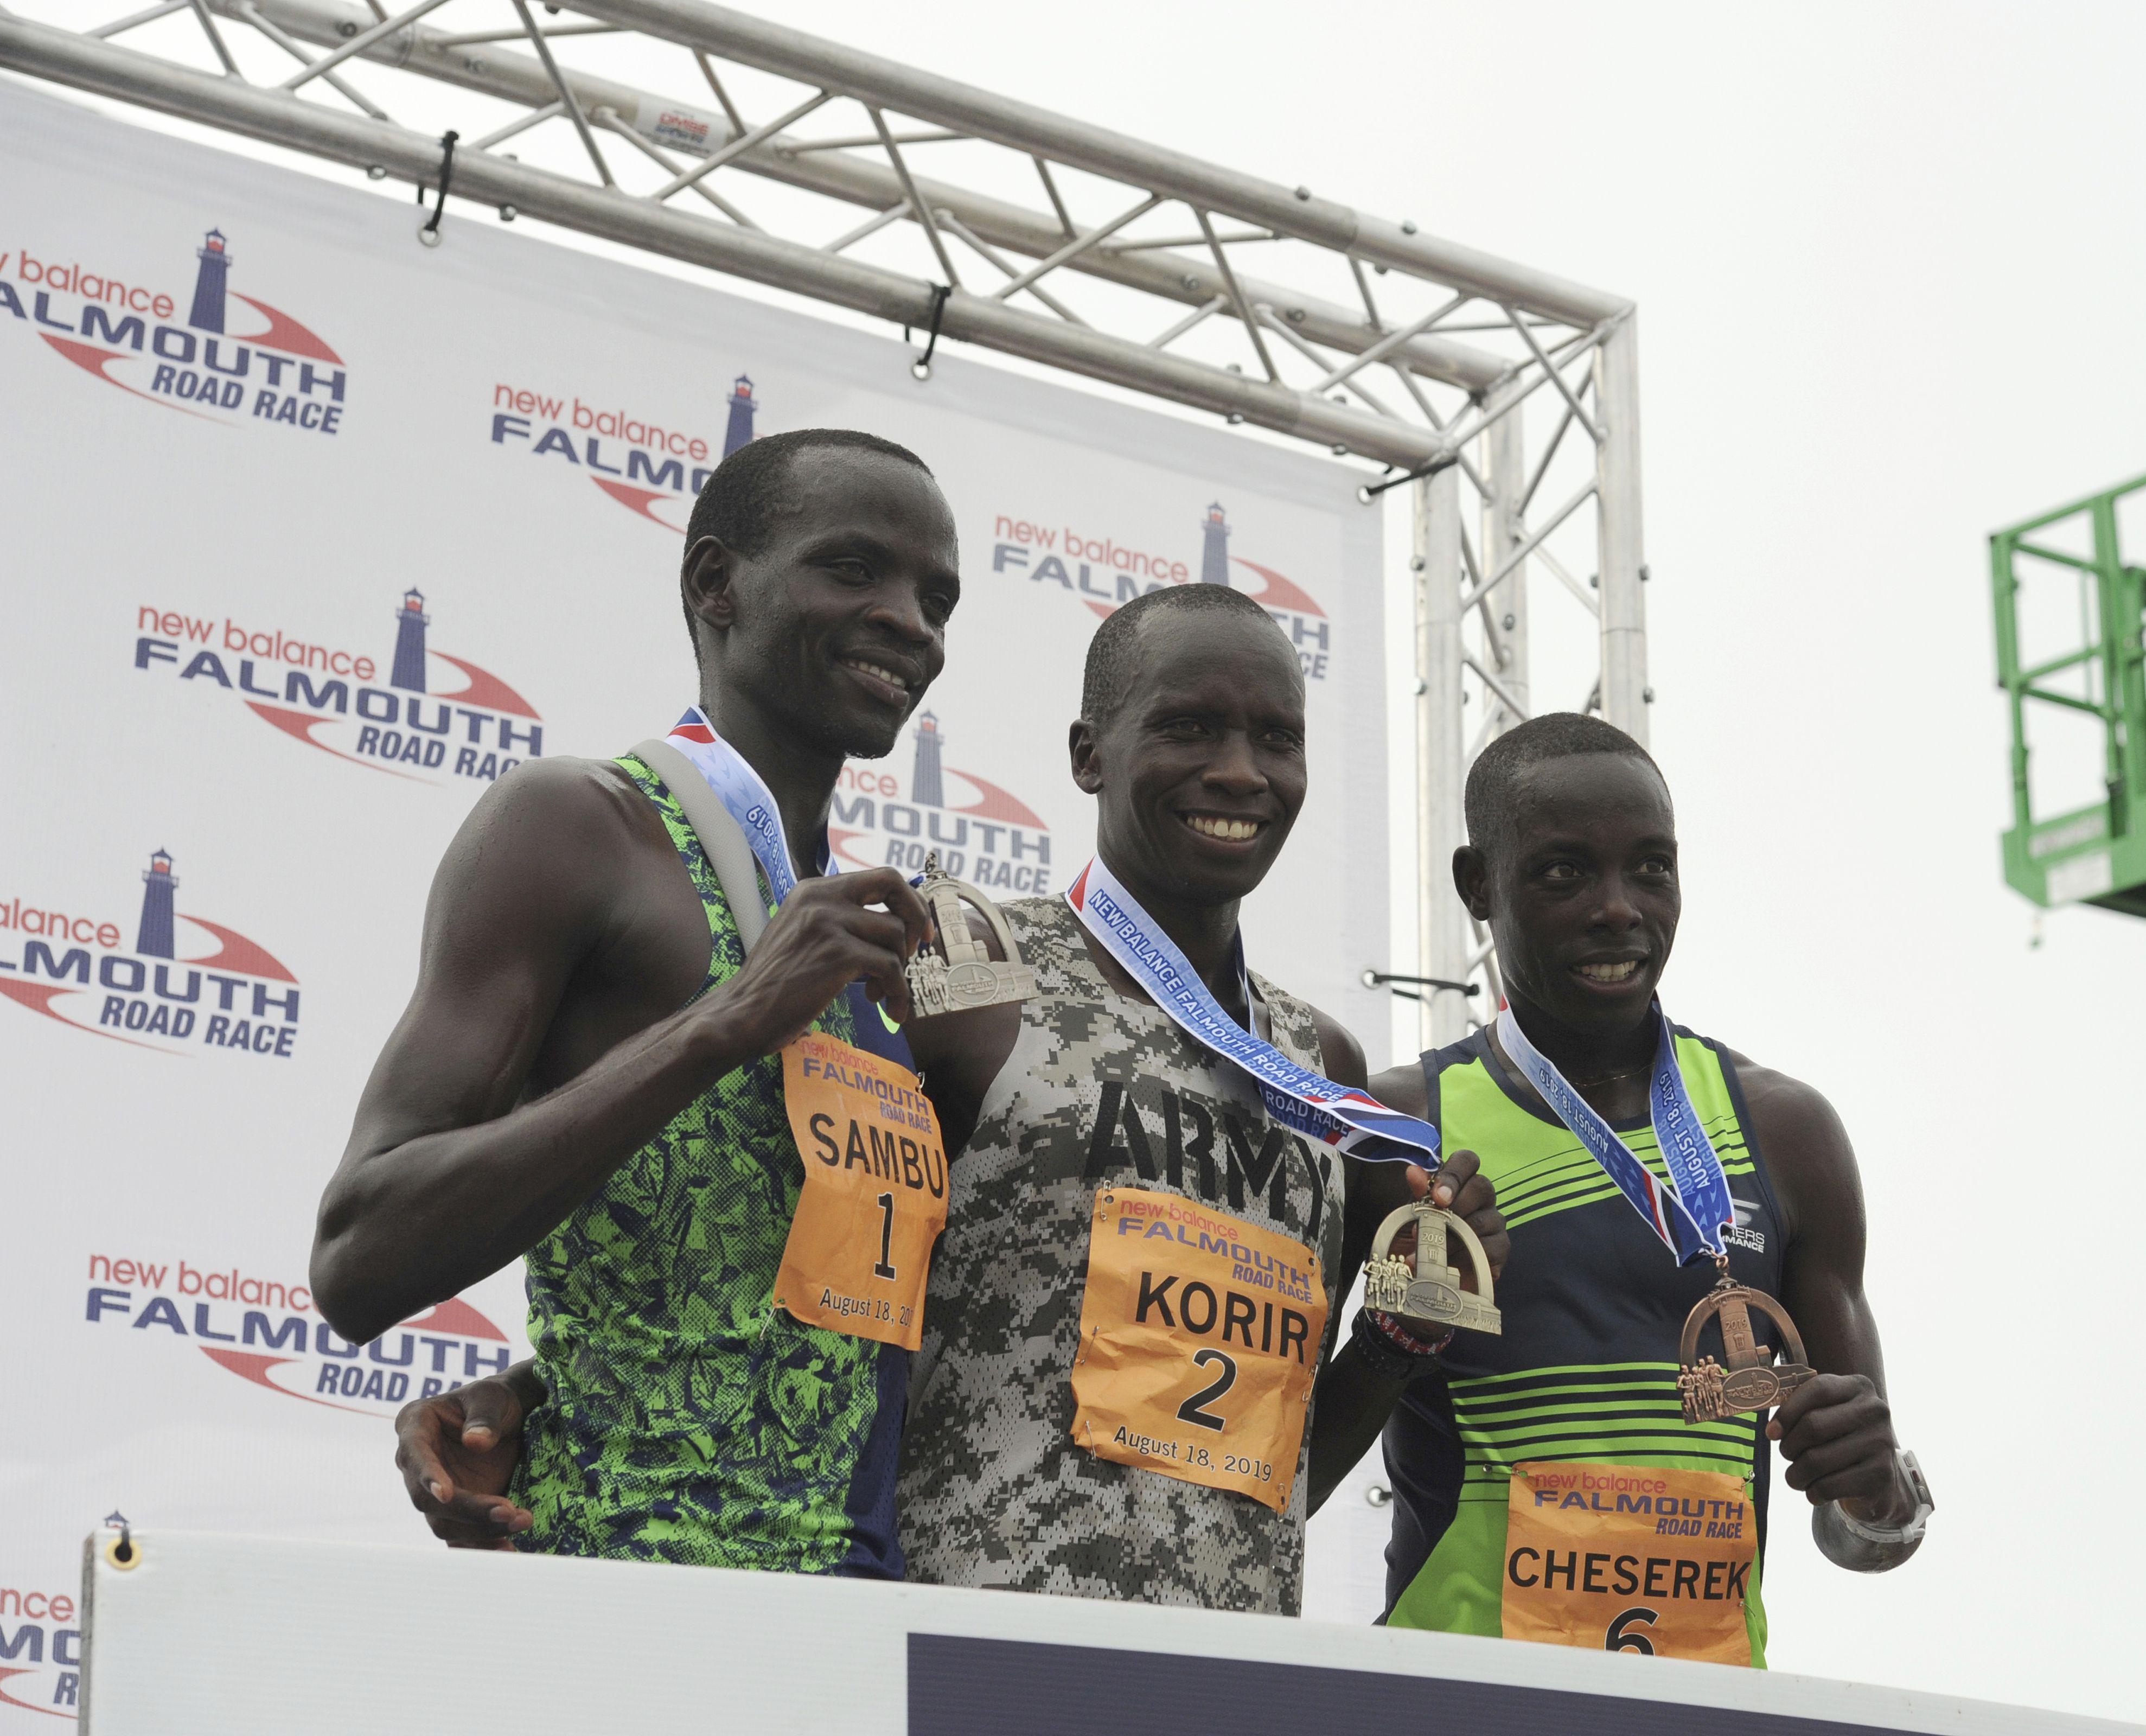 Leonard Korir, Sharon Lokedi capture first-place finishes at